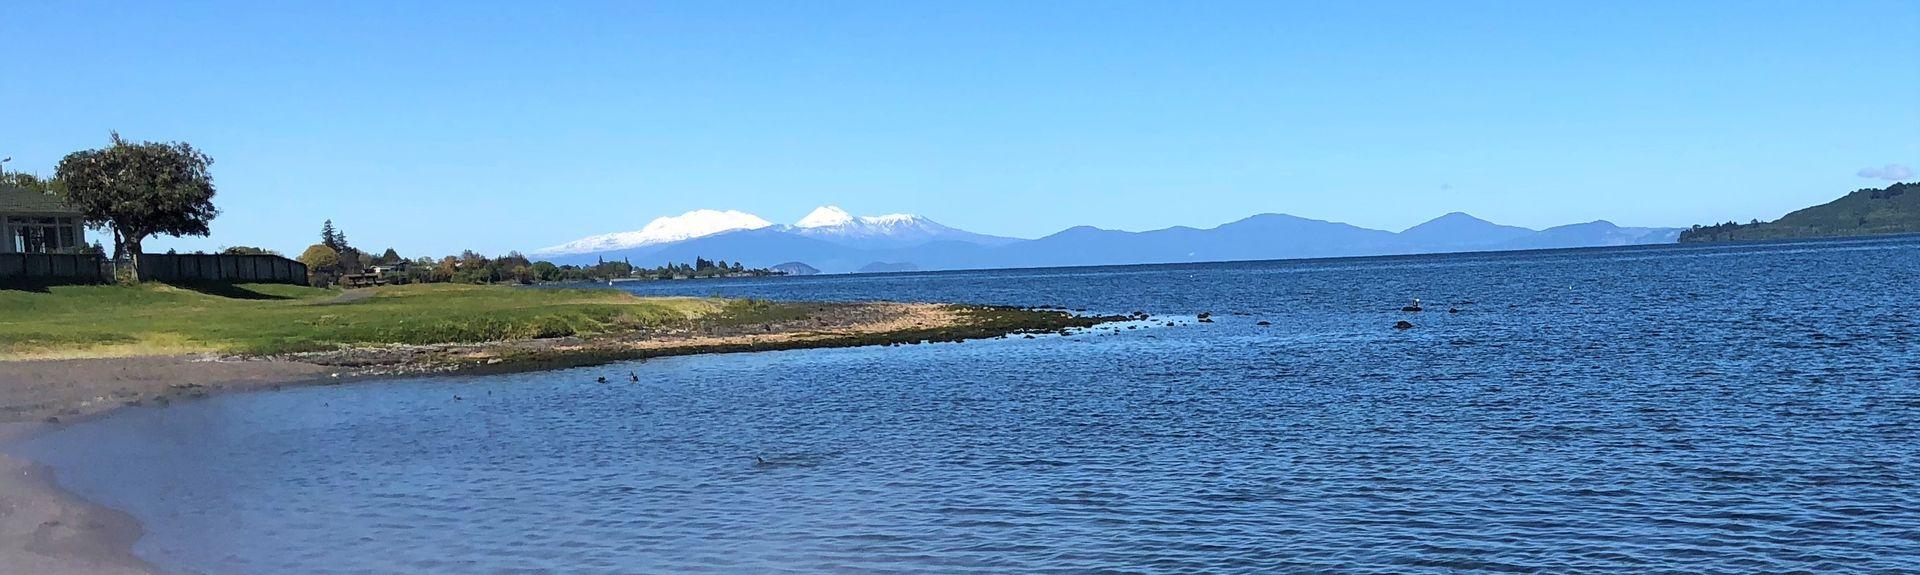 Richmond Heights, Taupo, Waikato, New Zealand